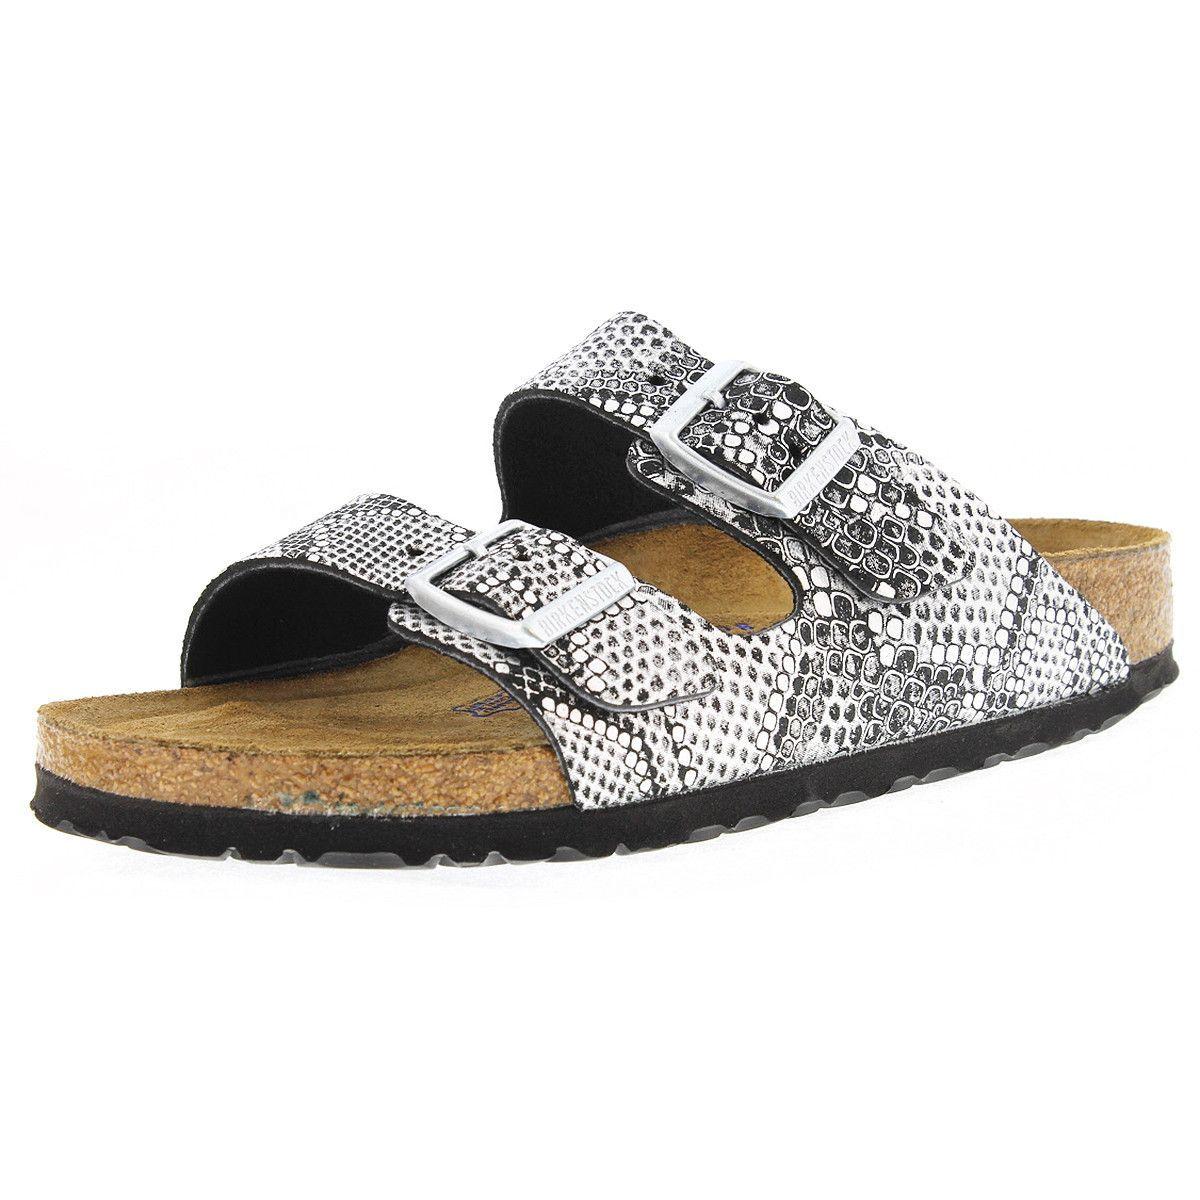 Birkenstock - Women s Arizona Soft Footbed Sandal - Python Silver ... 7bbfbd394c5